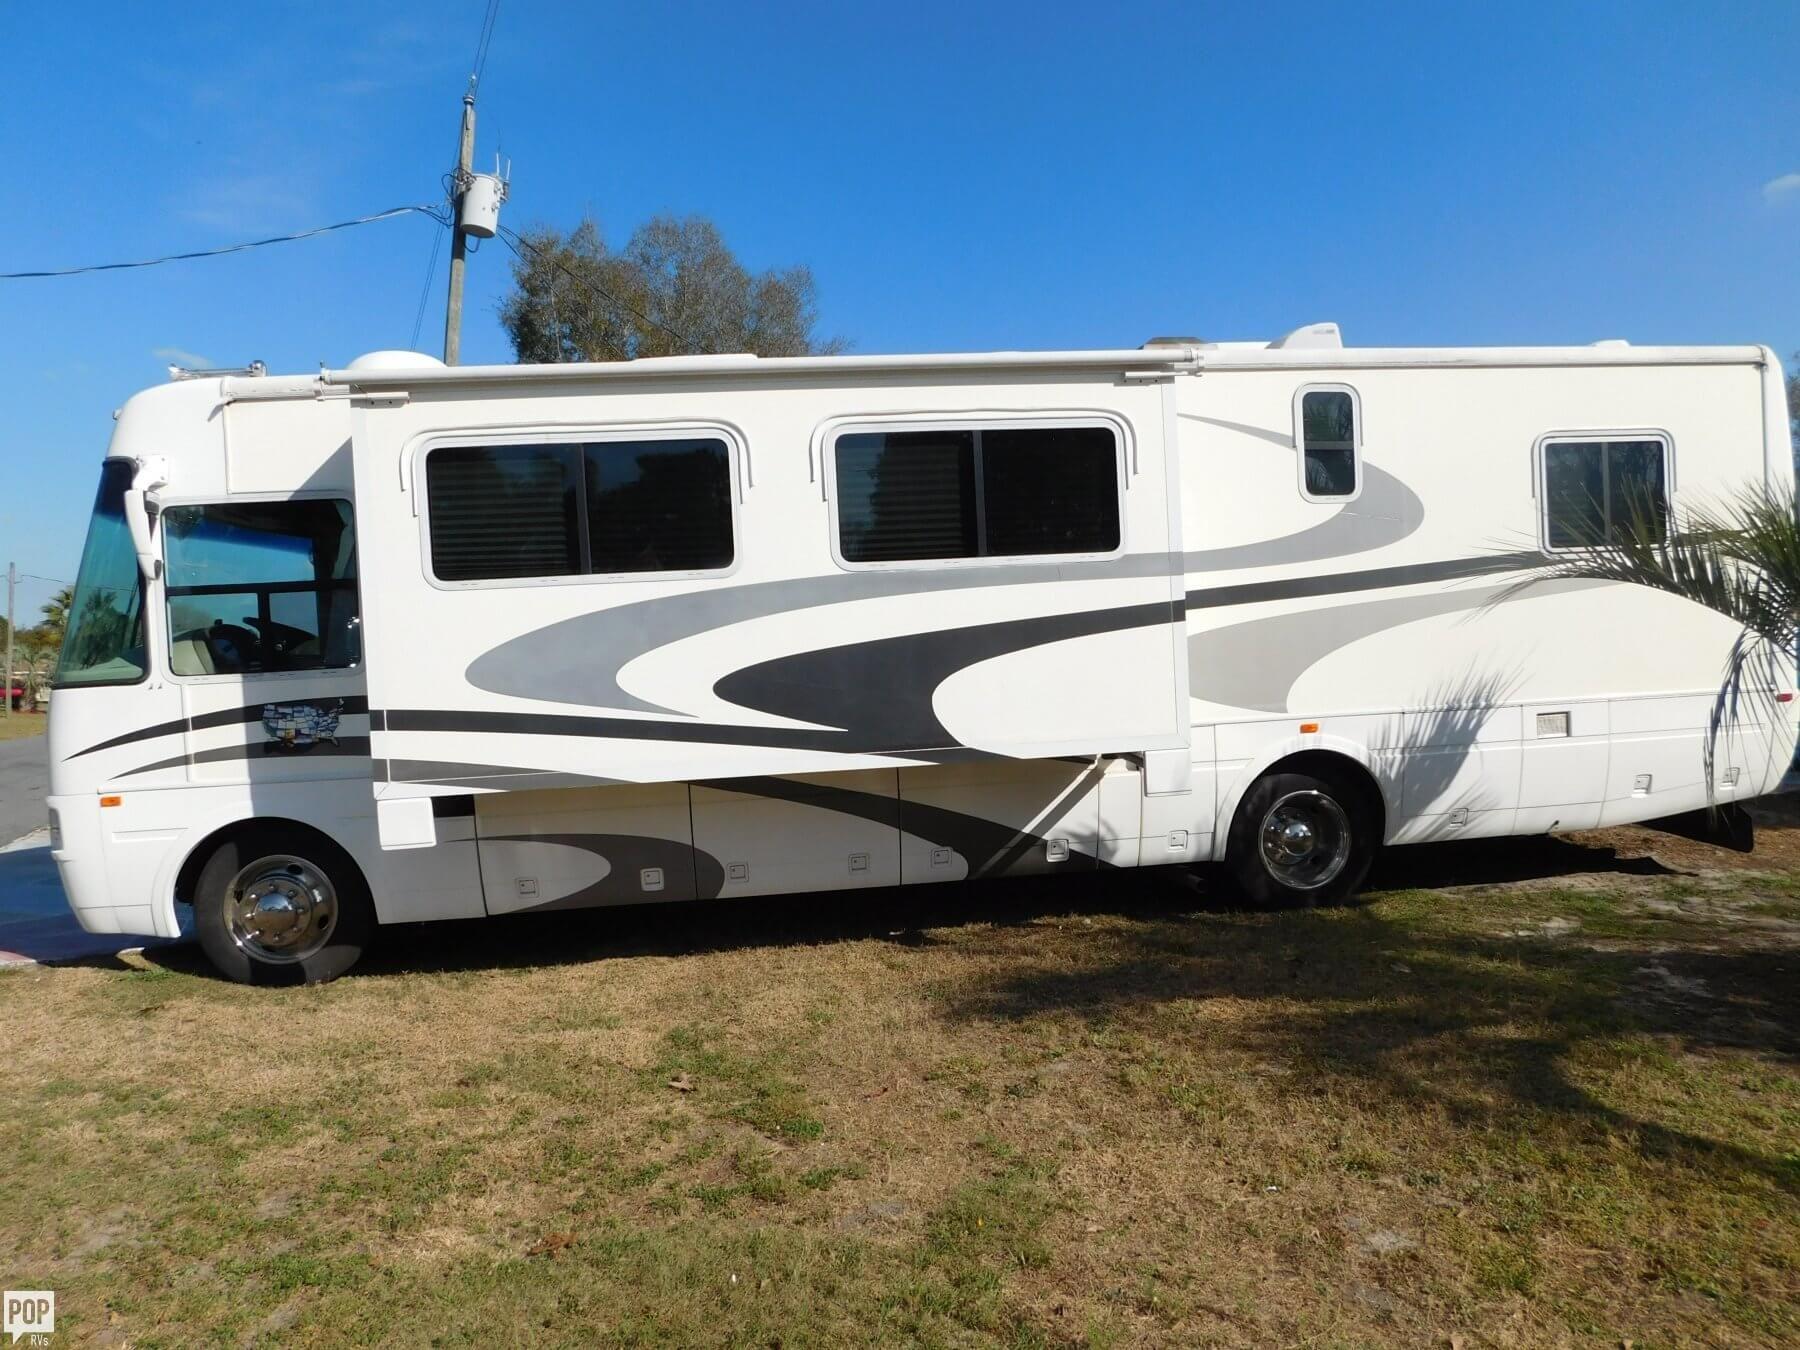 6342lx camper trailer for sale campers for sale rvs